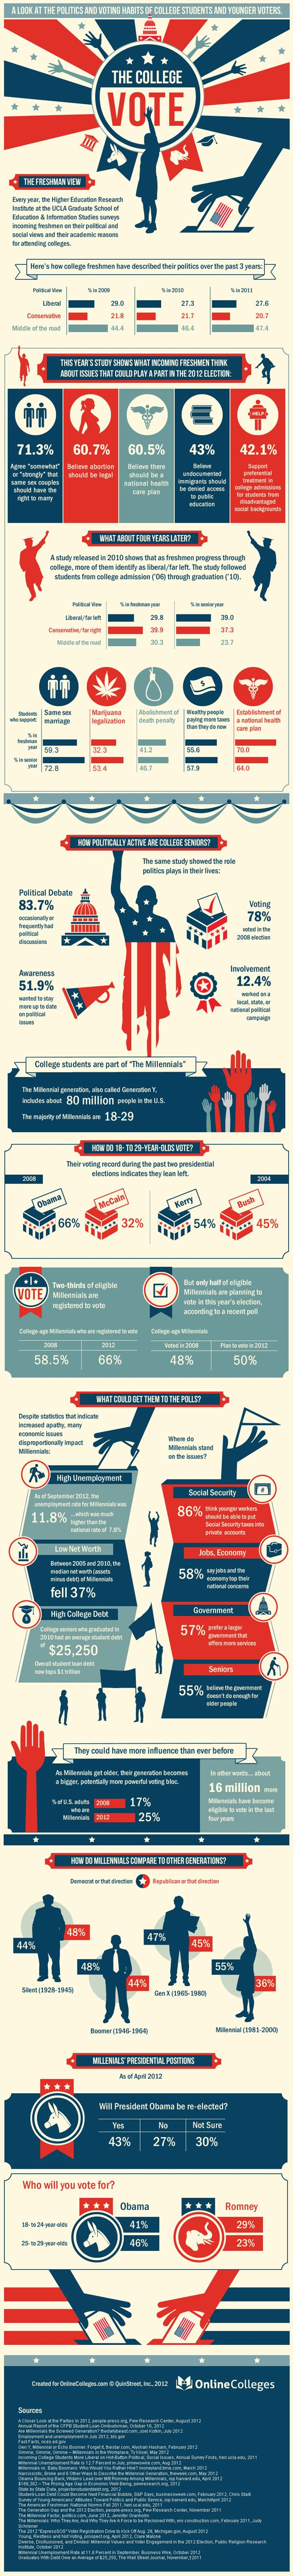 Unique Infographic Design, The College Vote #Infographic #Design (http://www.pinterest.com/aldenchong/)